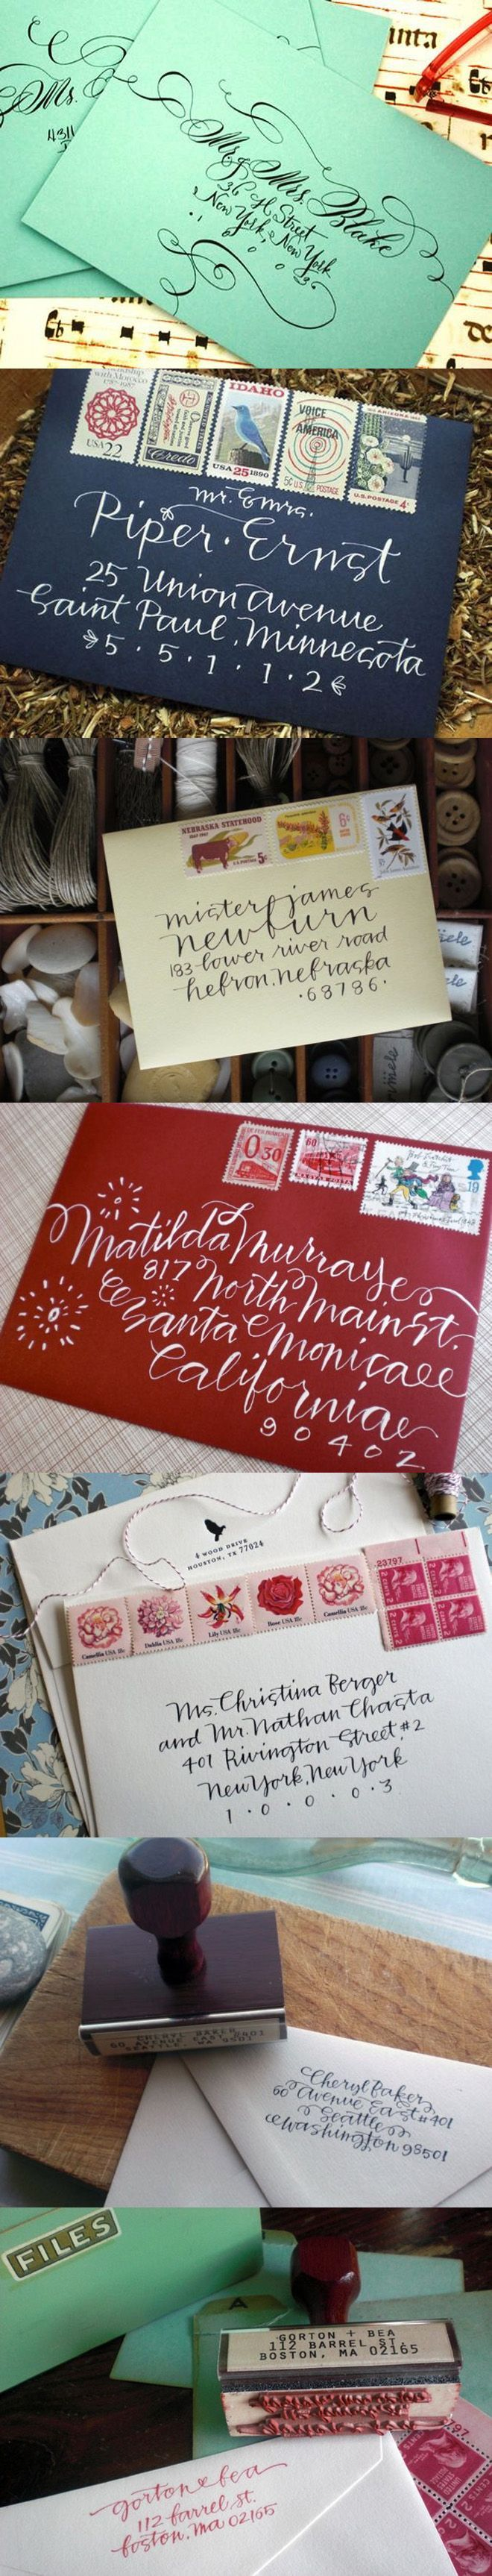 how to return address wedding envelopes%0A Handlettering Mailing Envelopes  calligraphy  handlettering  http   jonesdesigncompany com things